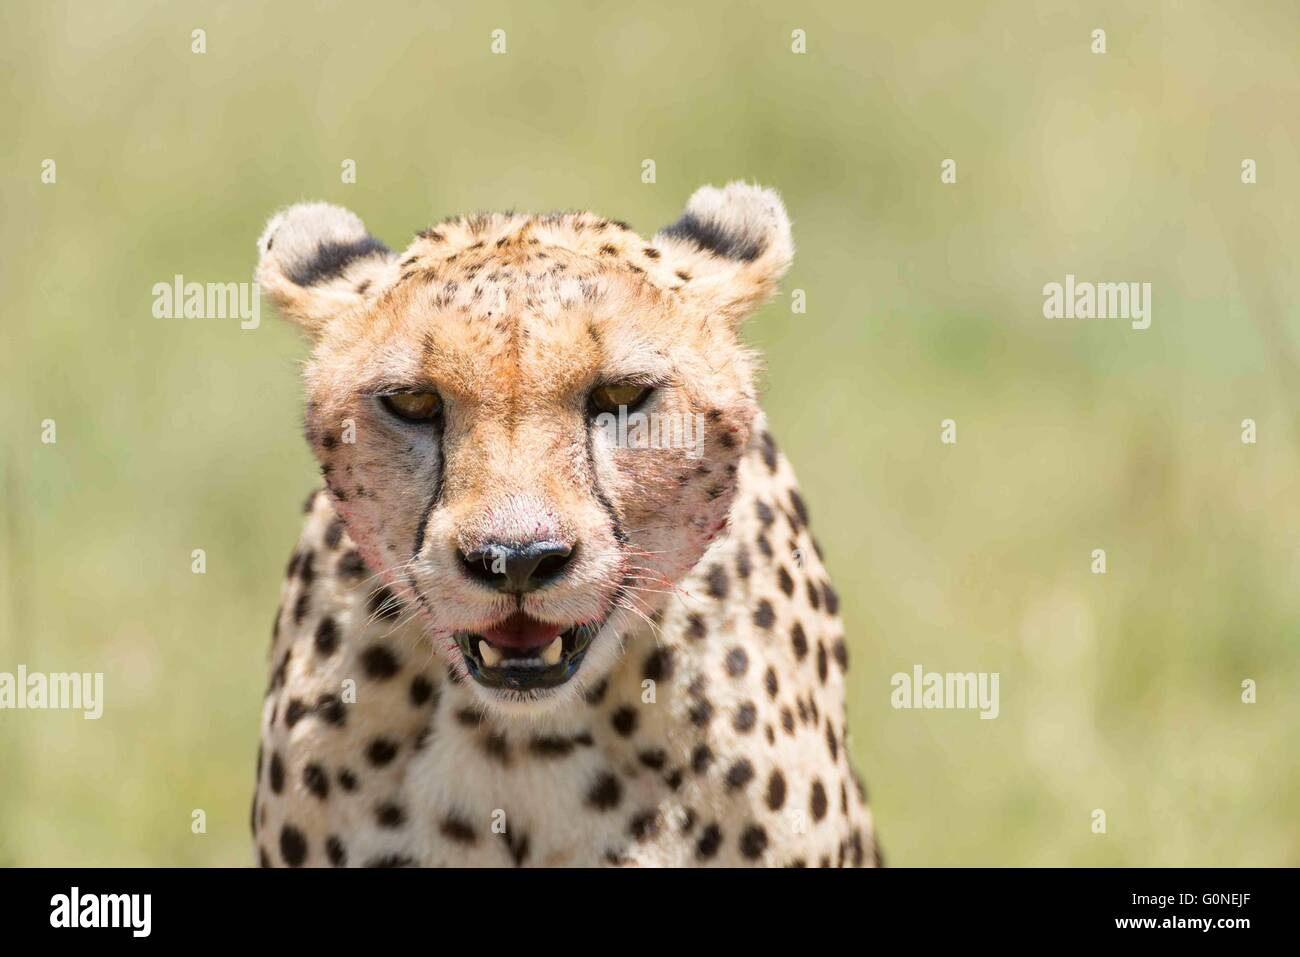 Portrait of cheetah - Stock Image